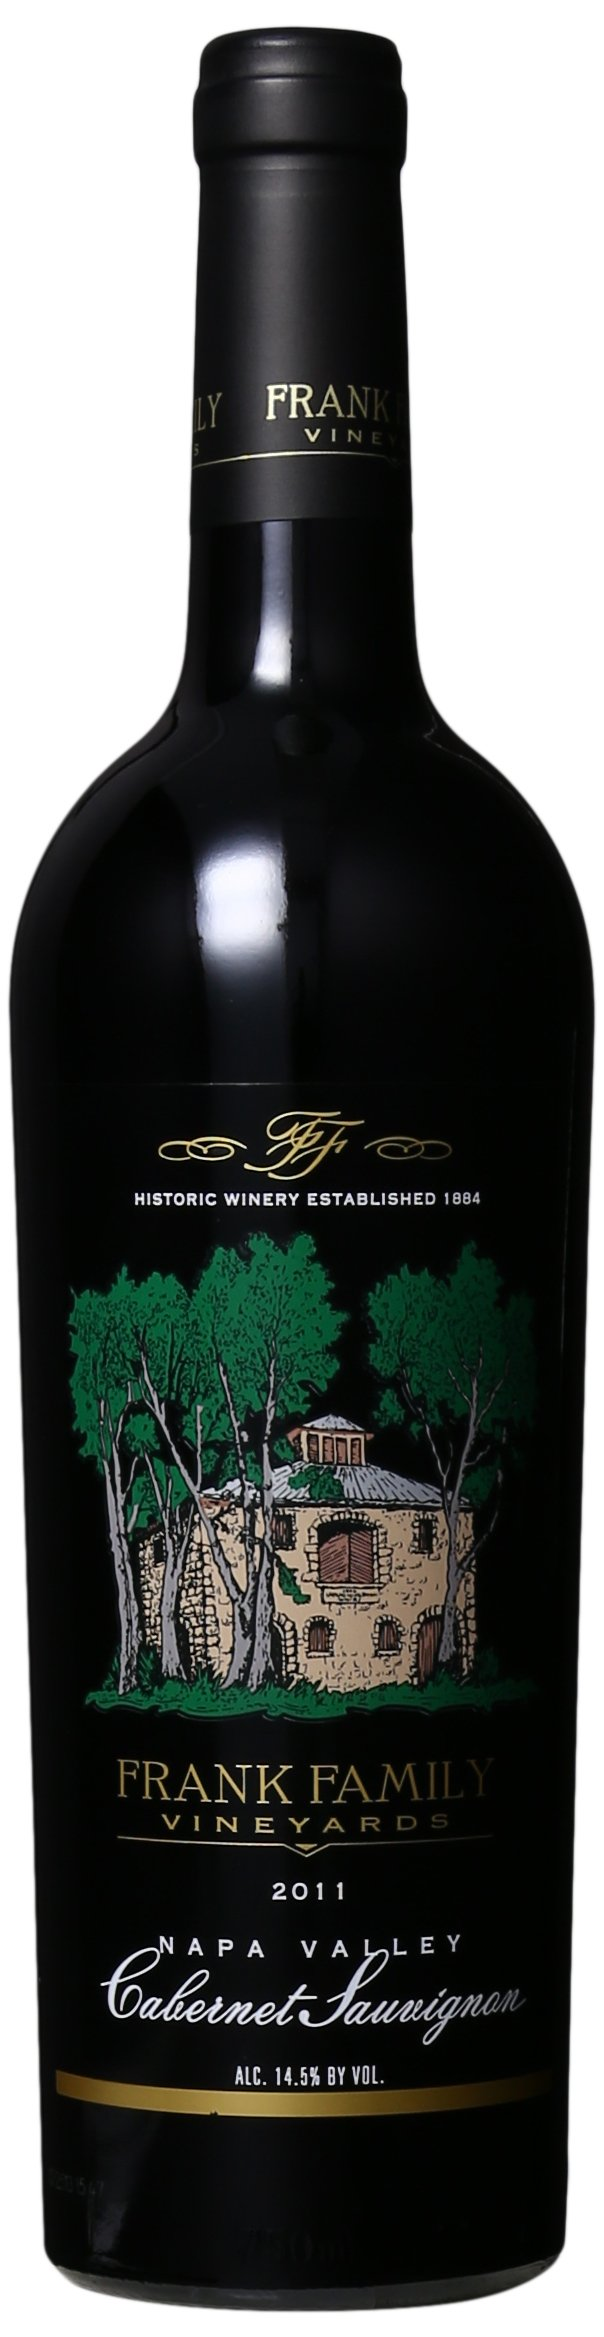 2011 Frank Family Vineyards Napa Valley Cabernet Sauvignon